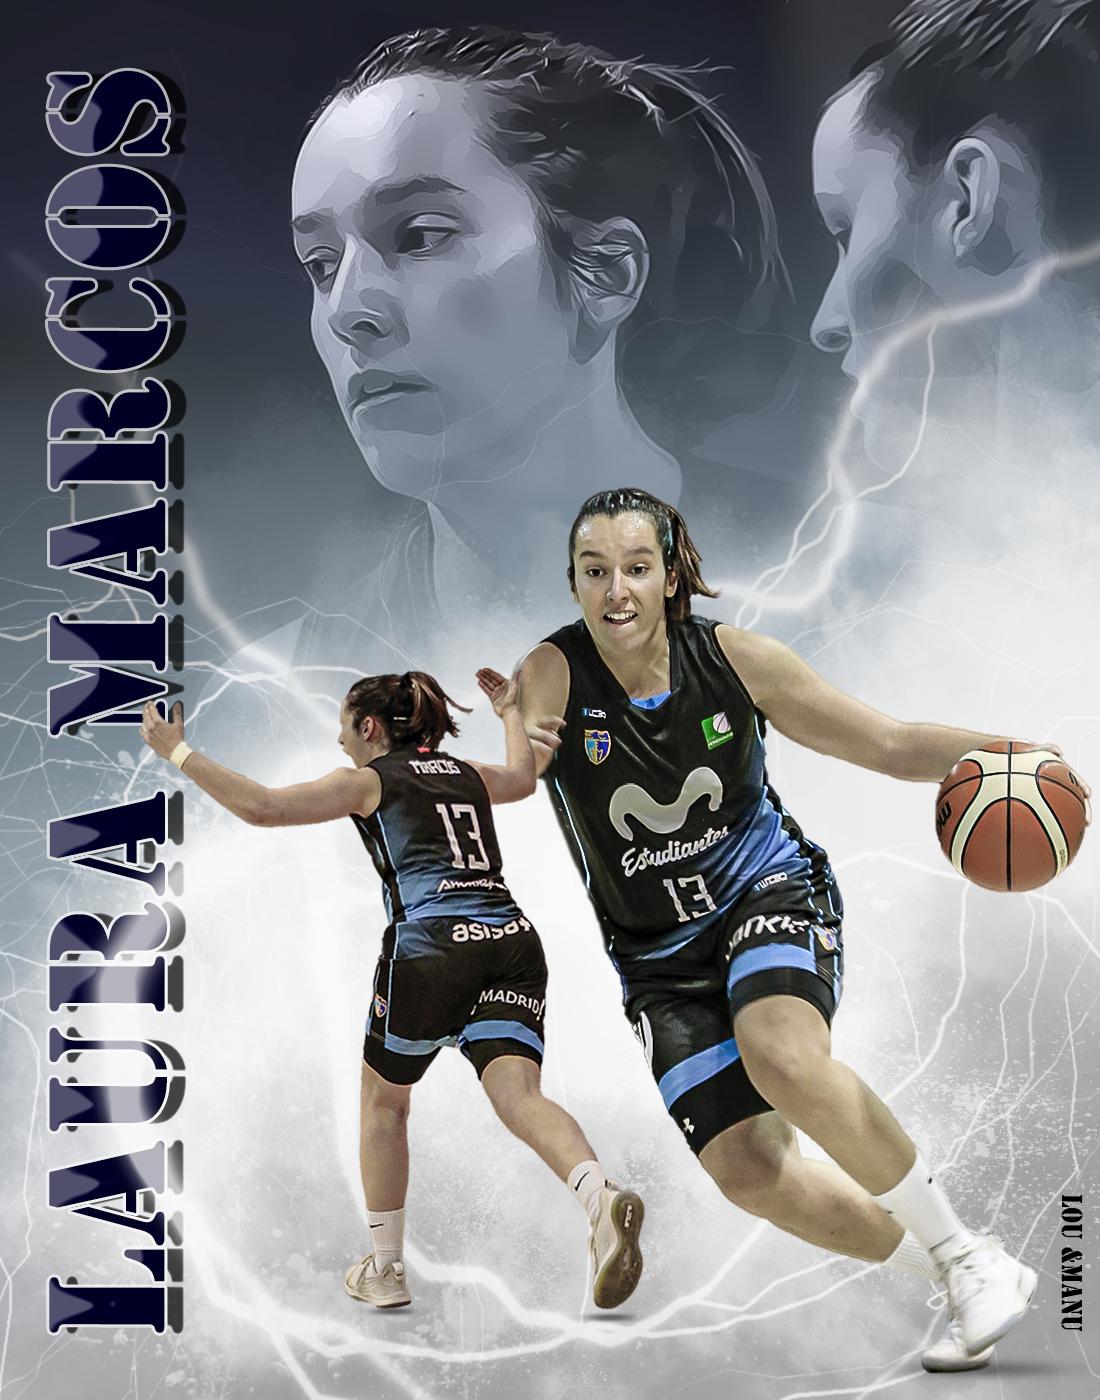 LauraMarcos13